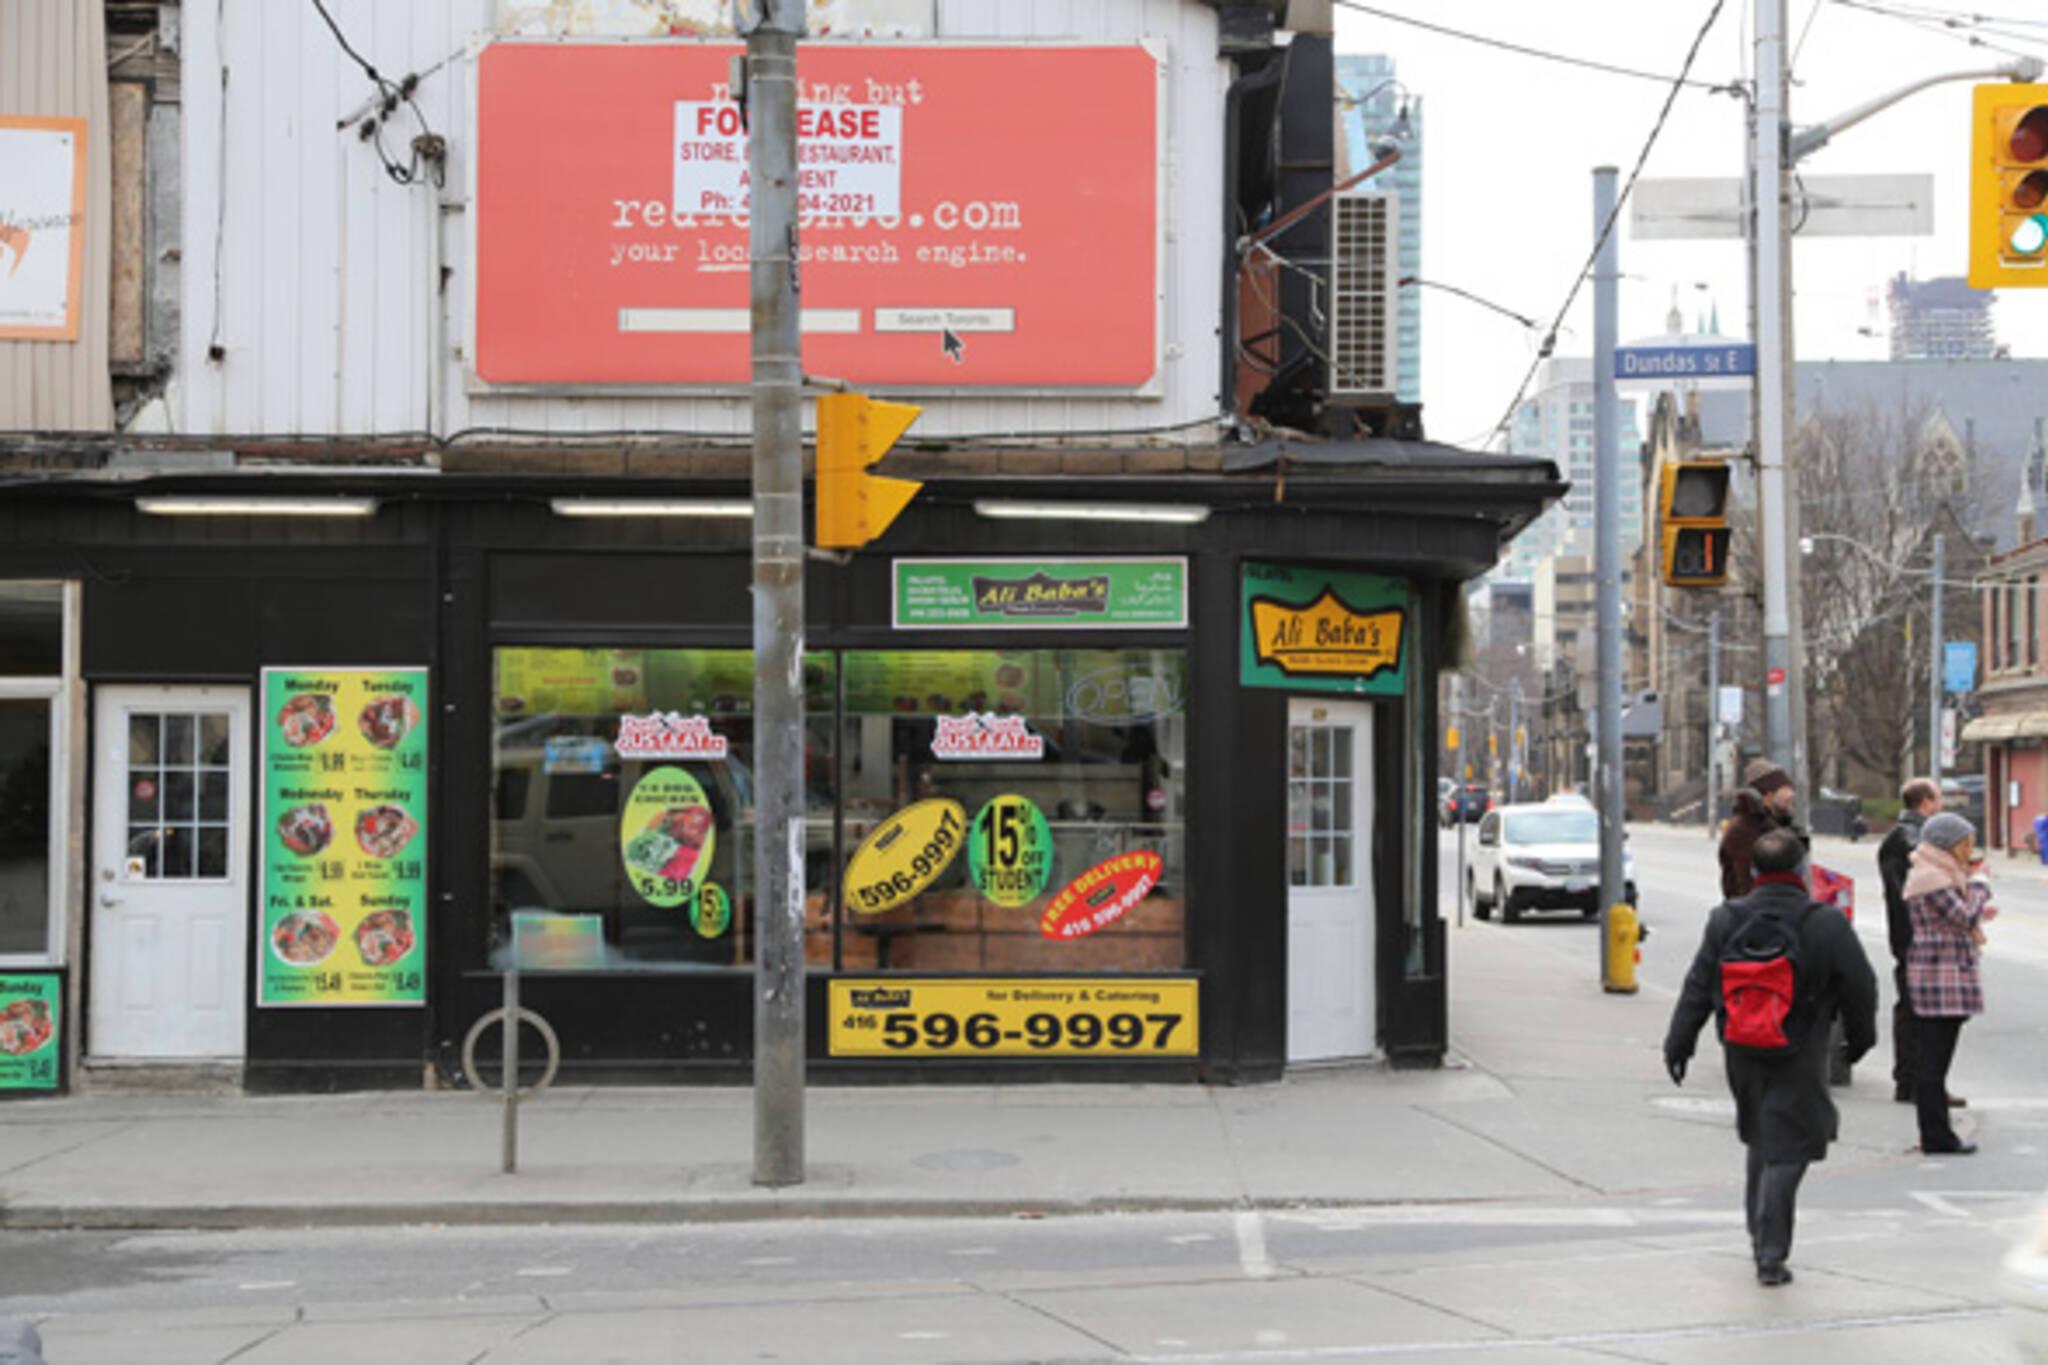 Ali Babas Toronto